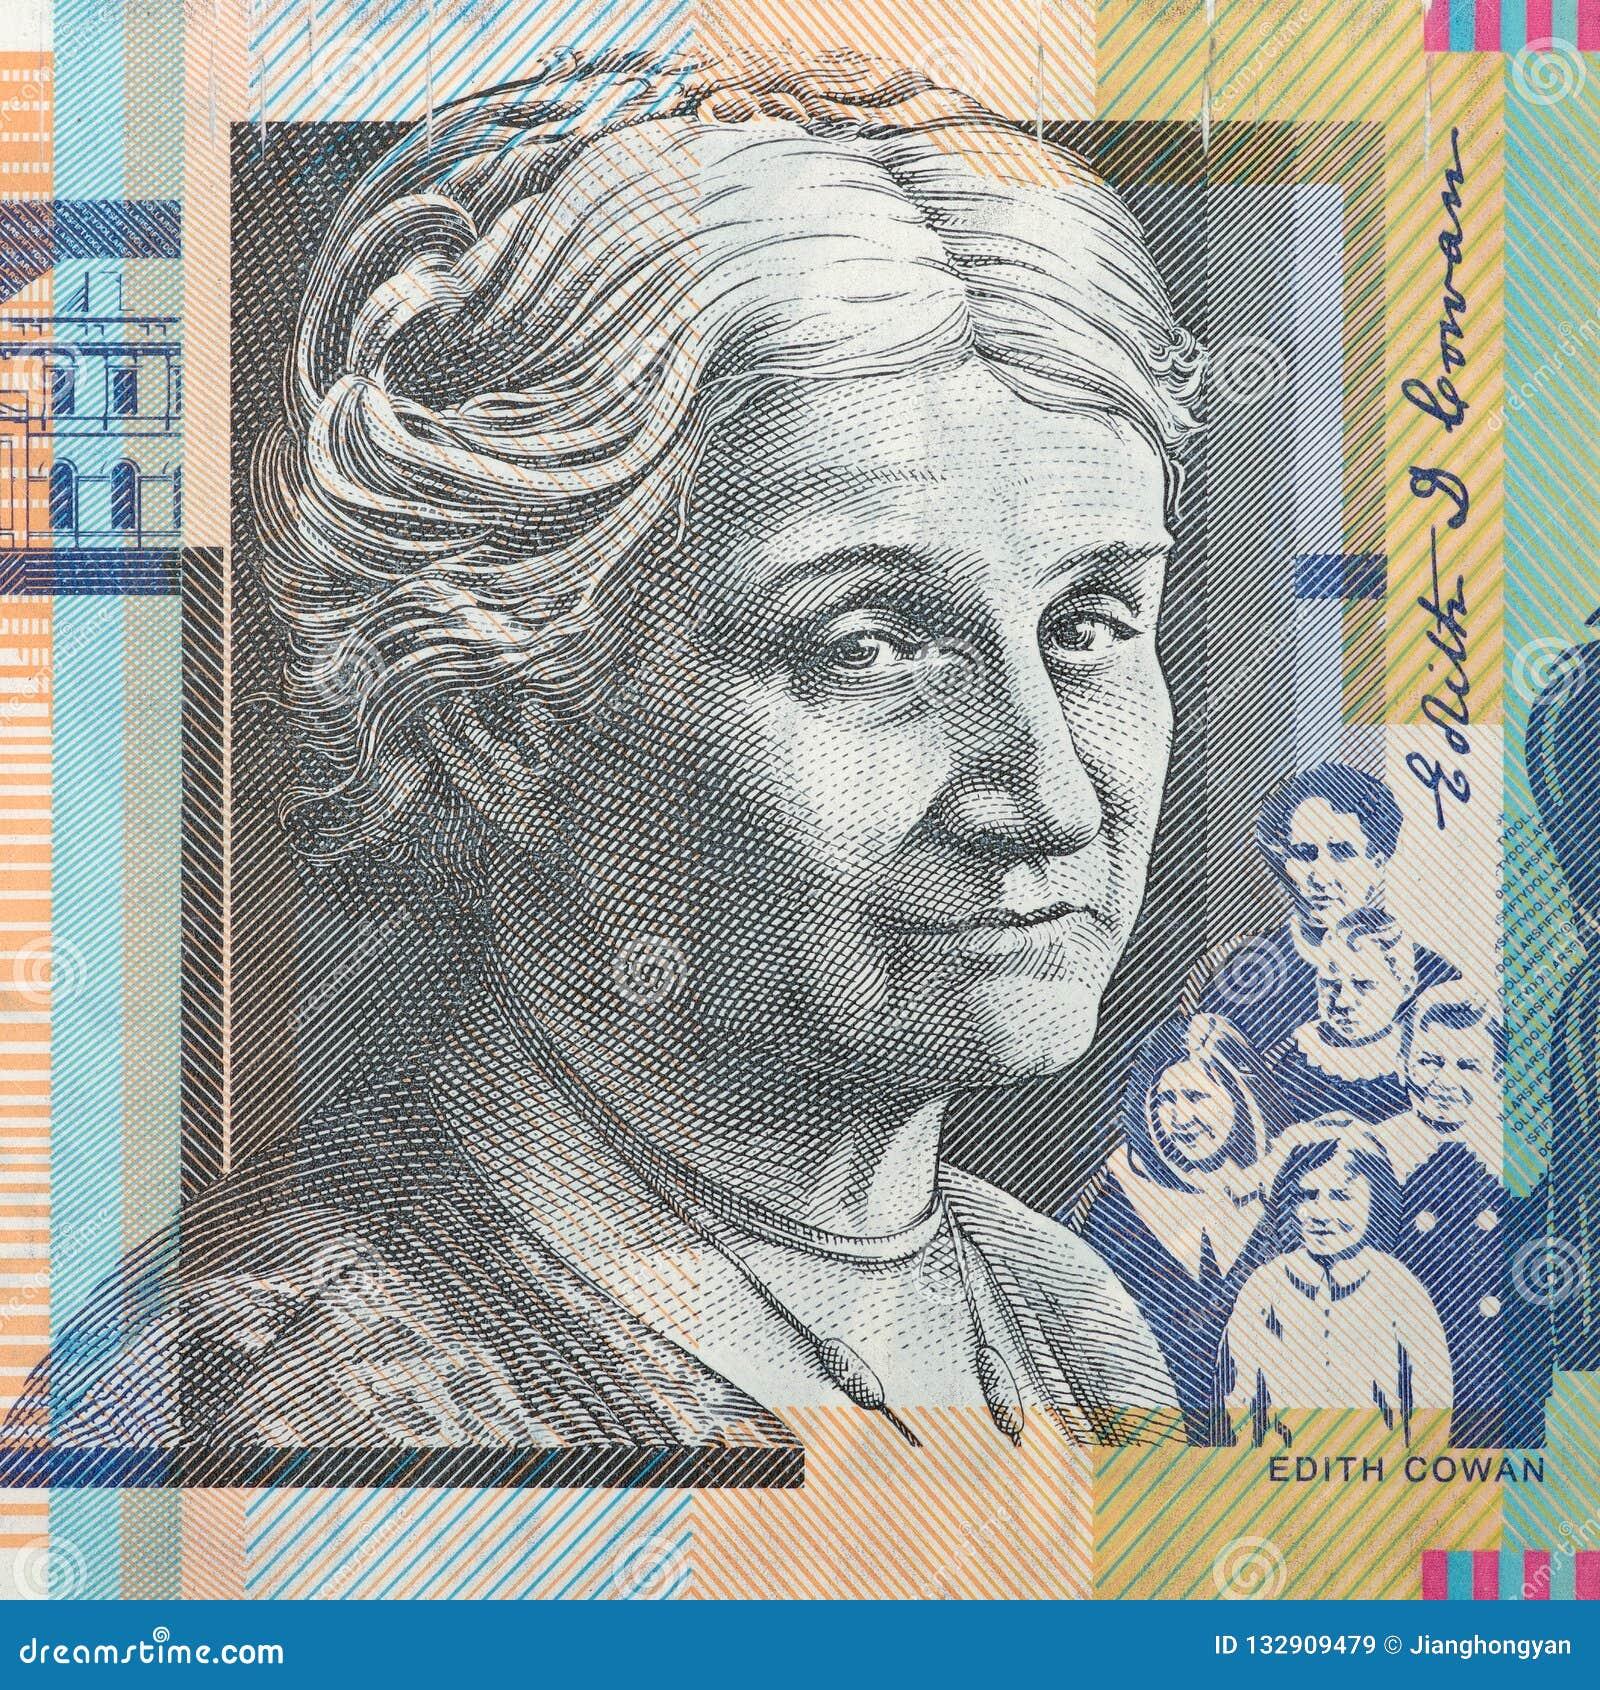 Portrait of Edith Cowan - Australian 50 dollar bill closeup